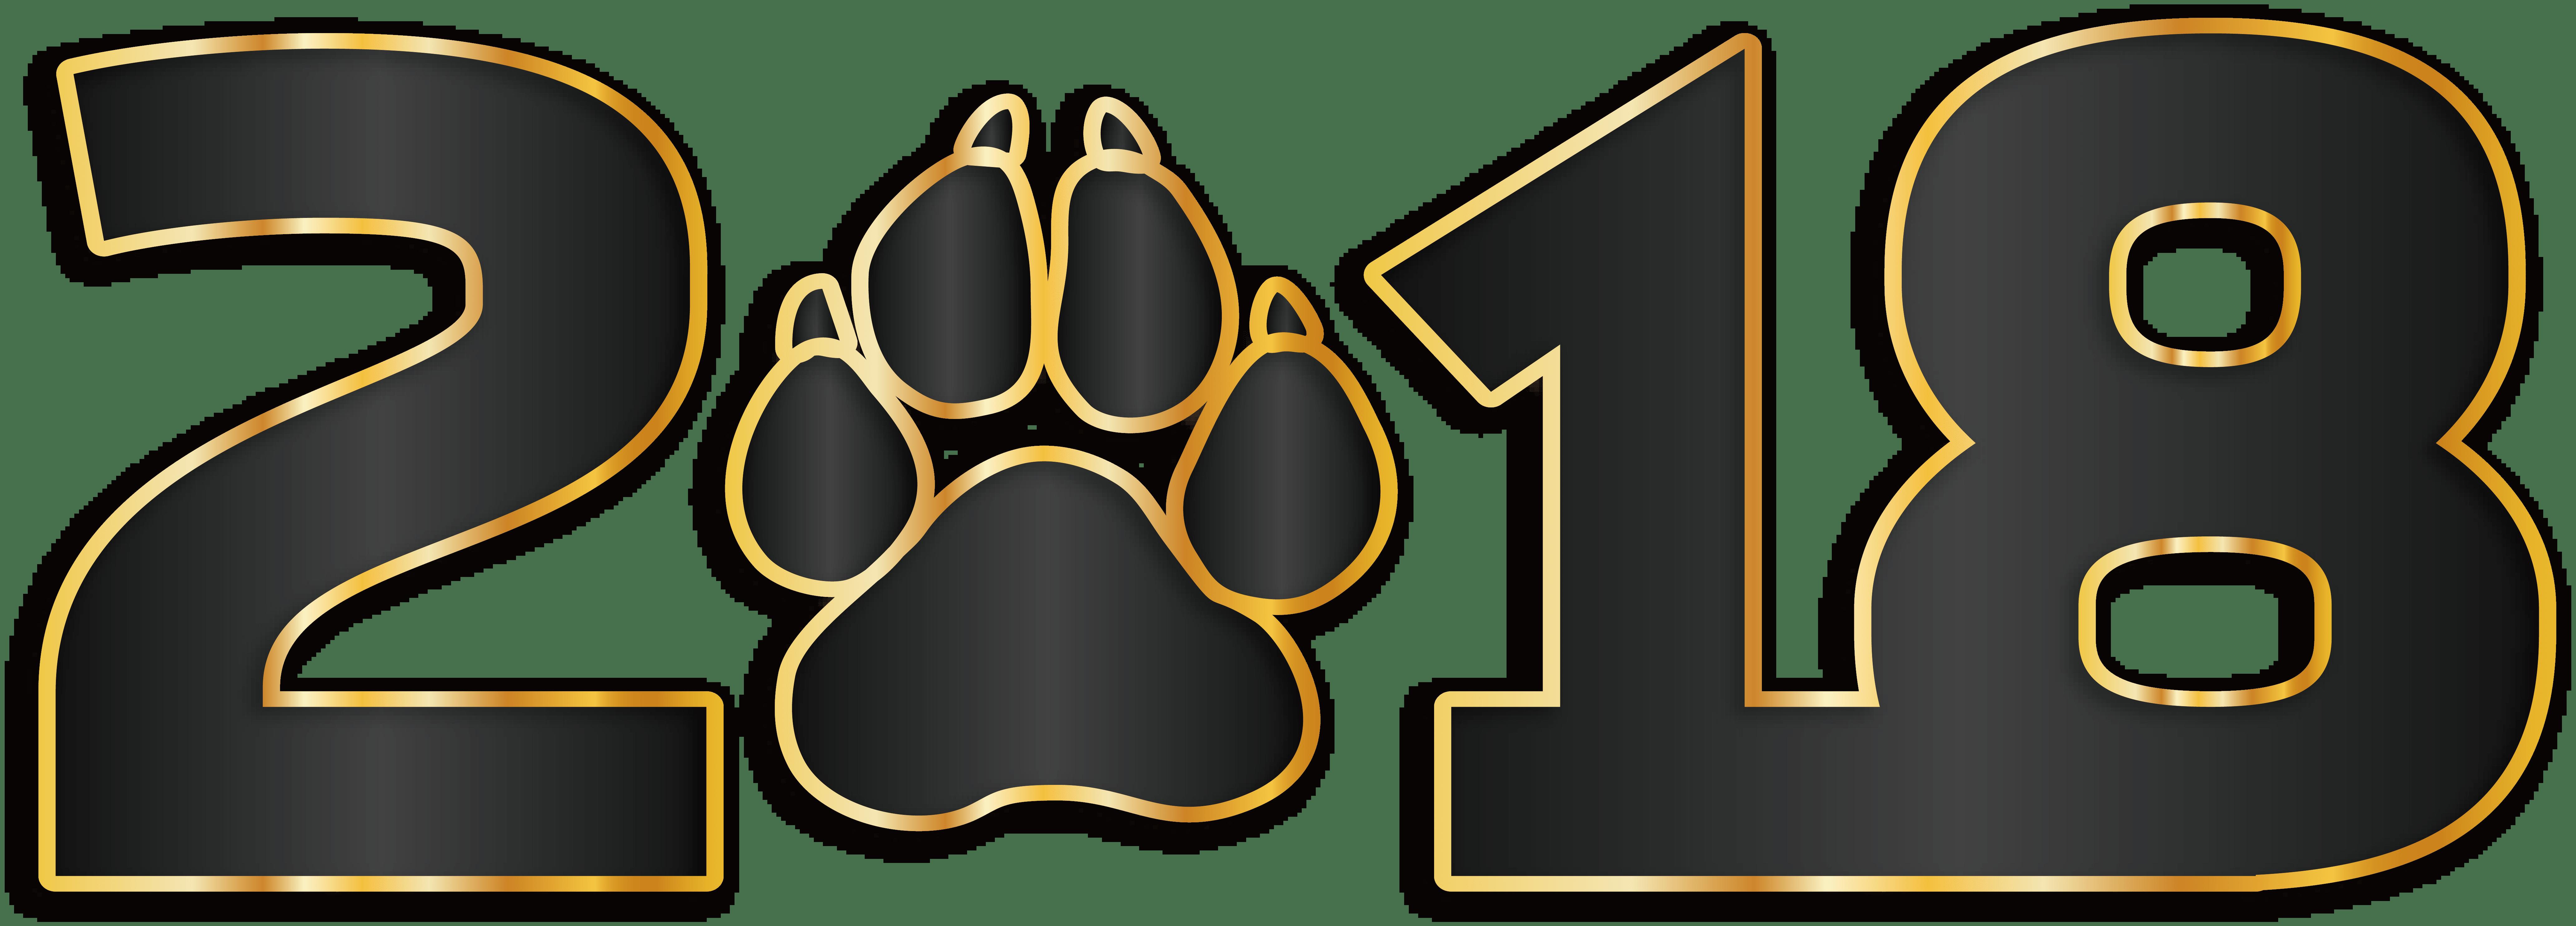 2018 Animals